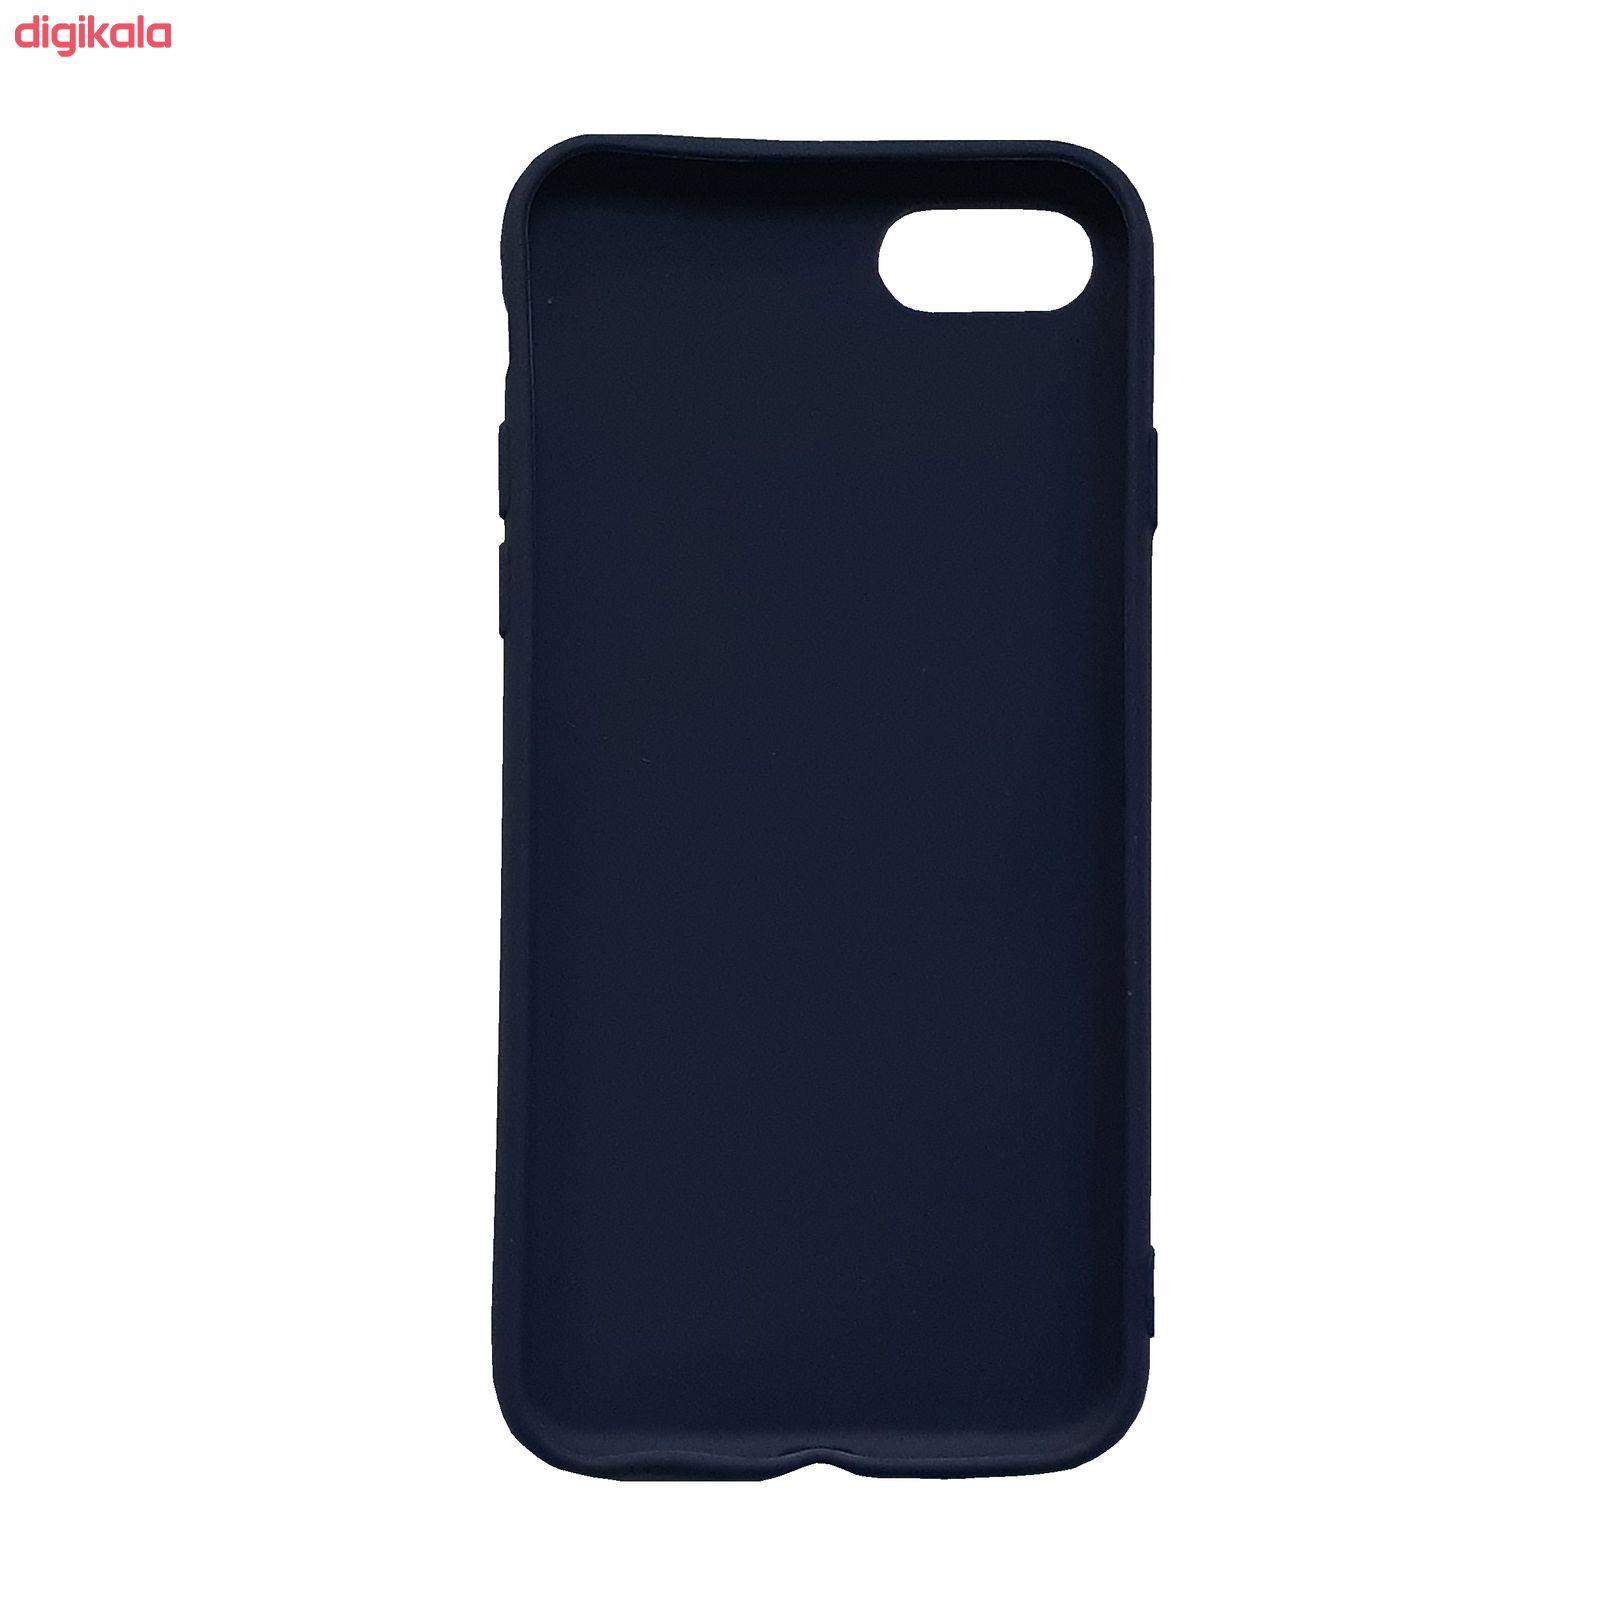 کاور مدل M-6G مناسب برای گوشی موبایل اپل iphone 6/6S main 1 6